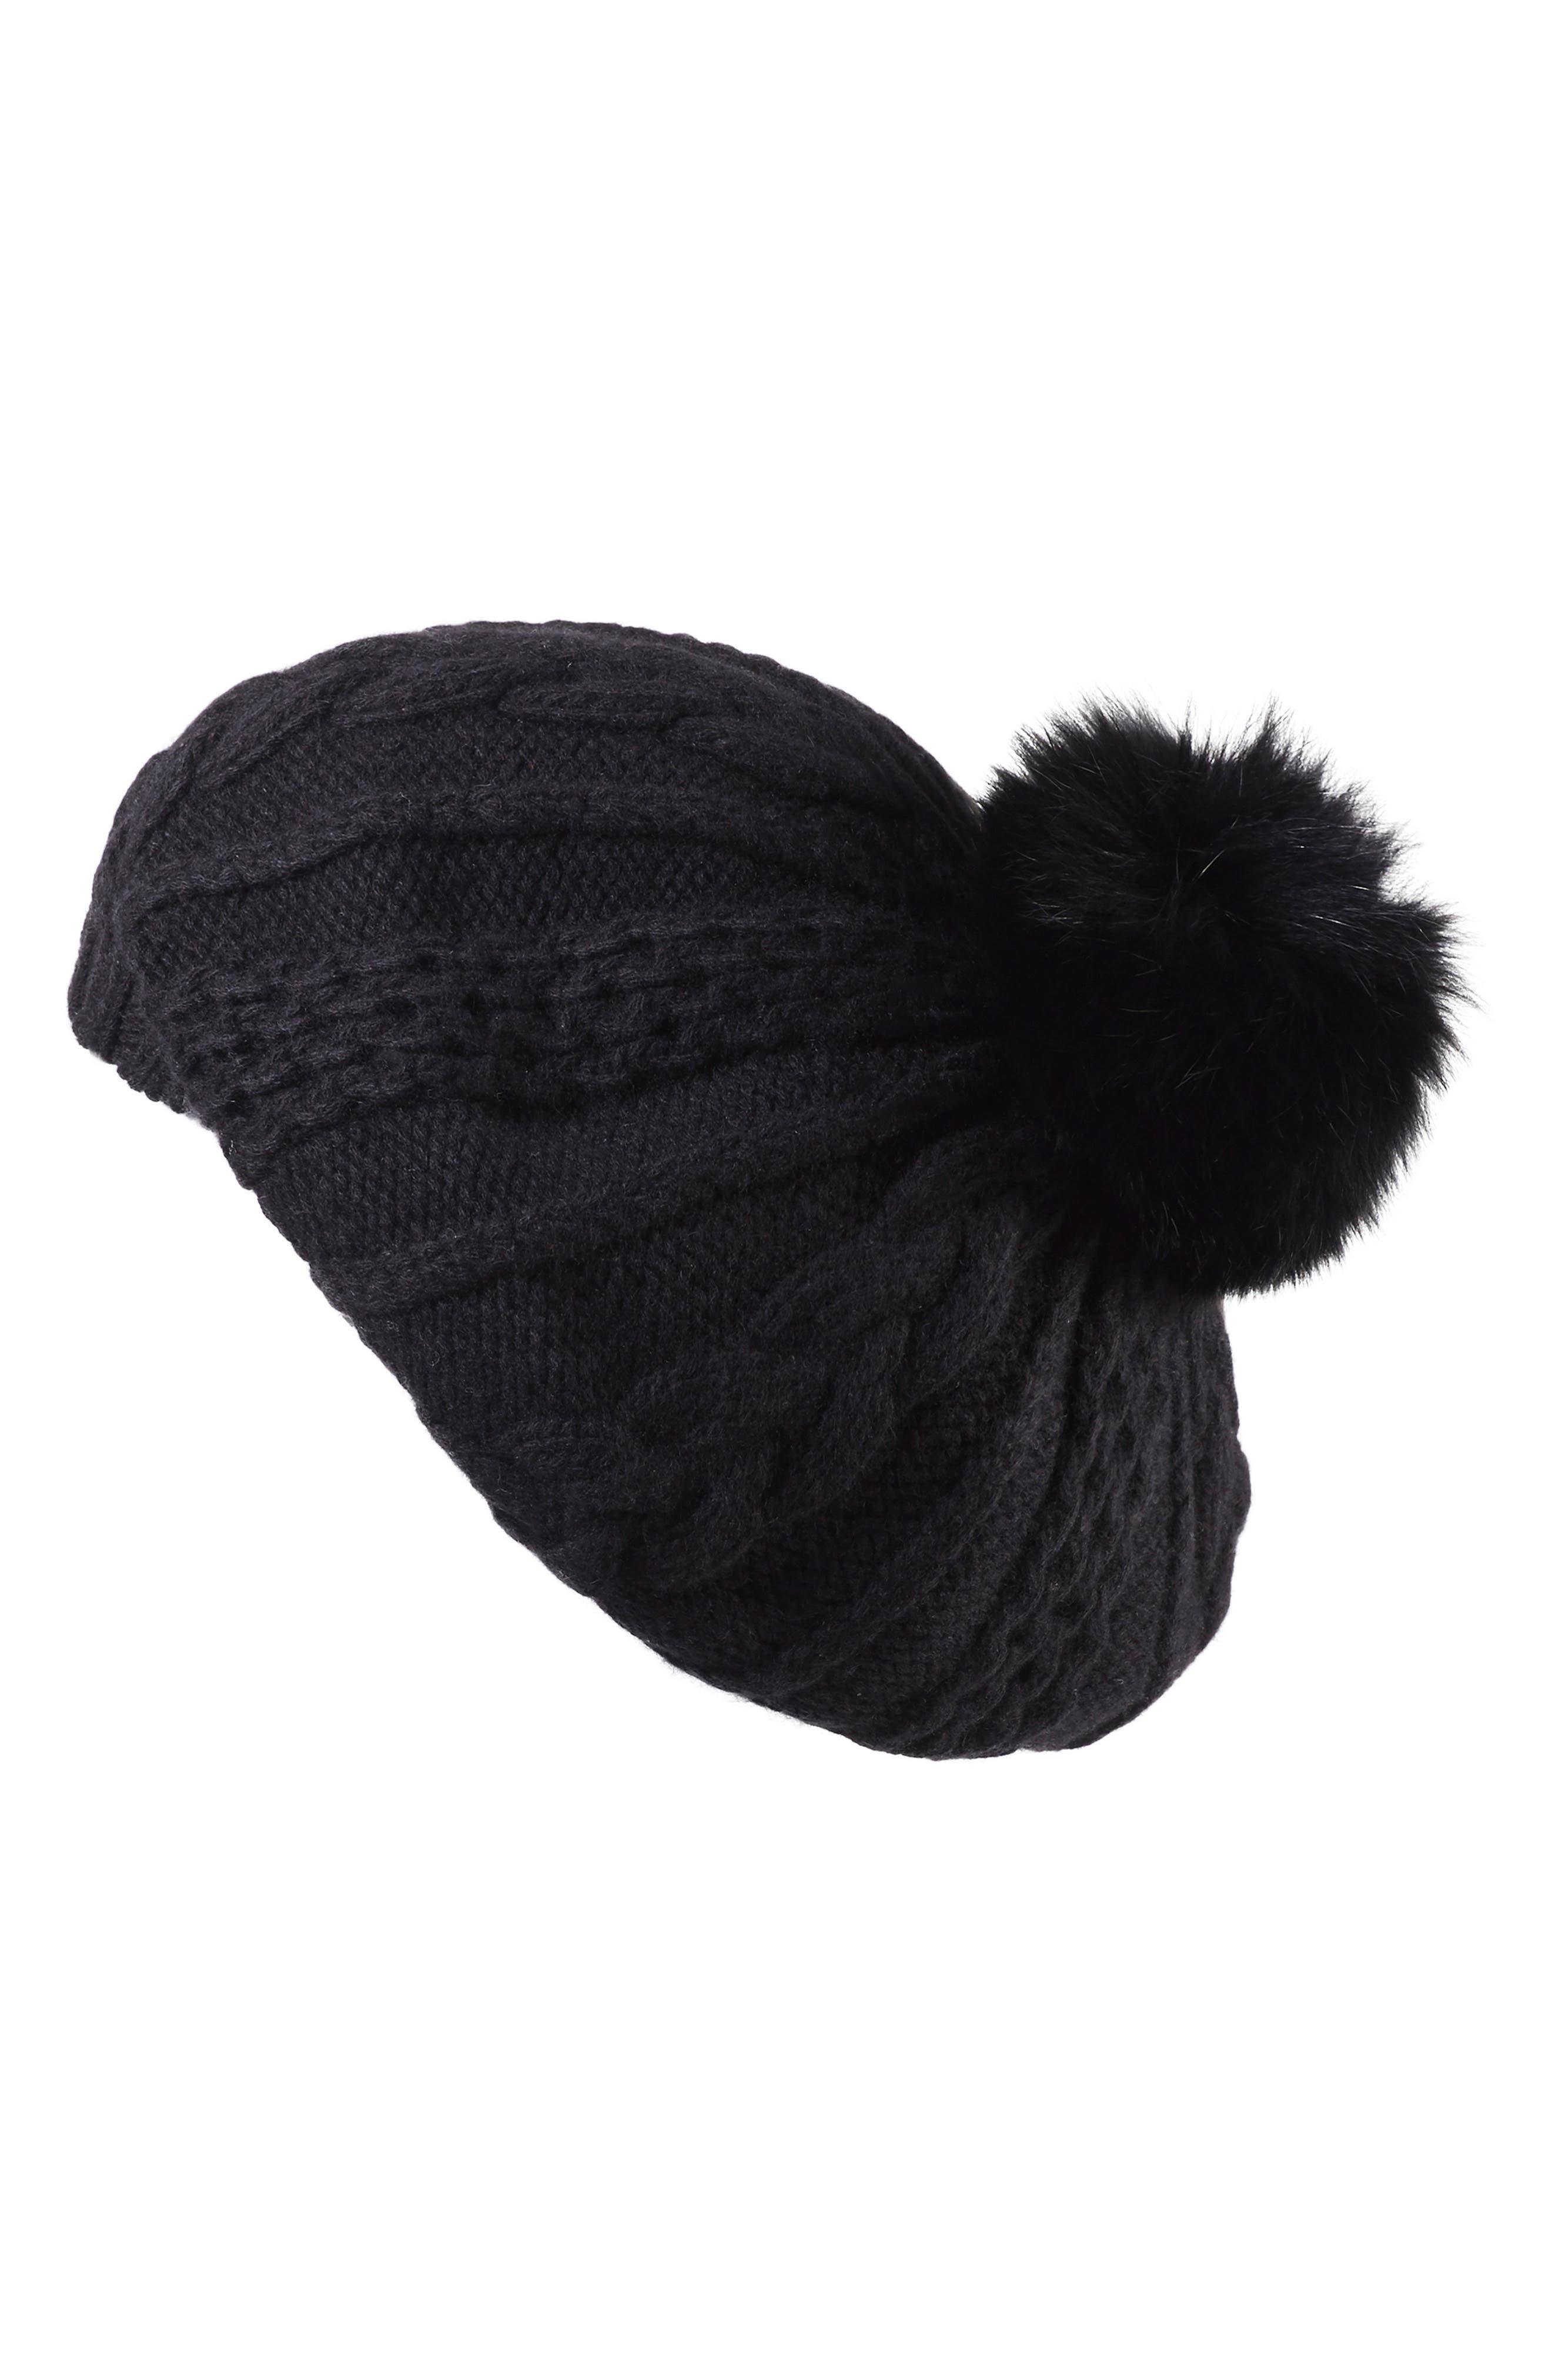 HELEN KAMINSKI Genuine Fox Fur Pompom Cashmere Beret - Black